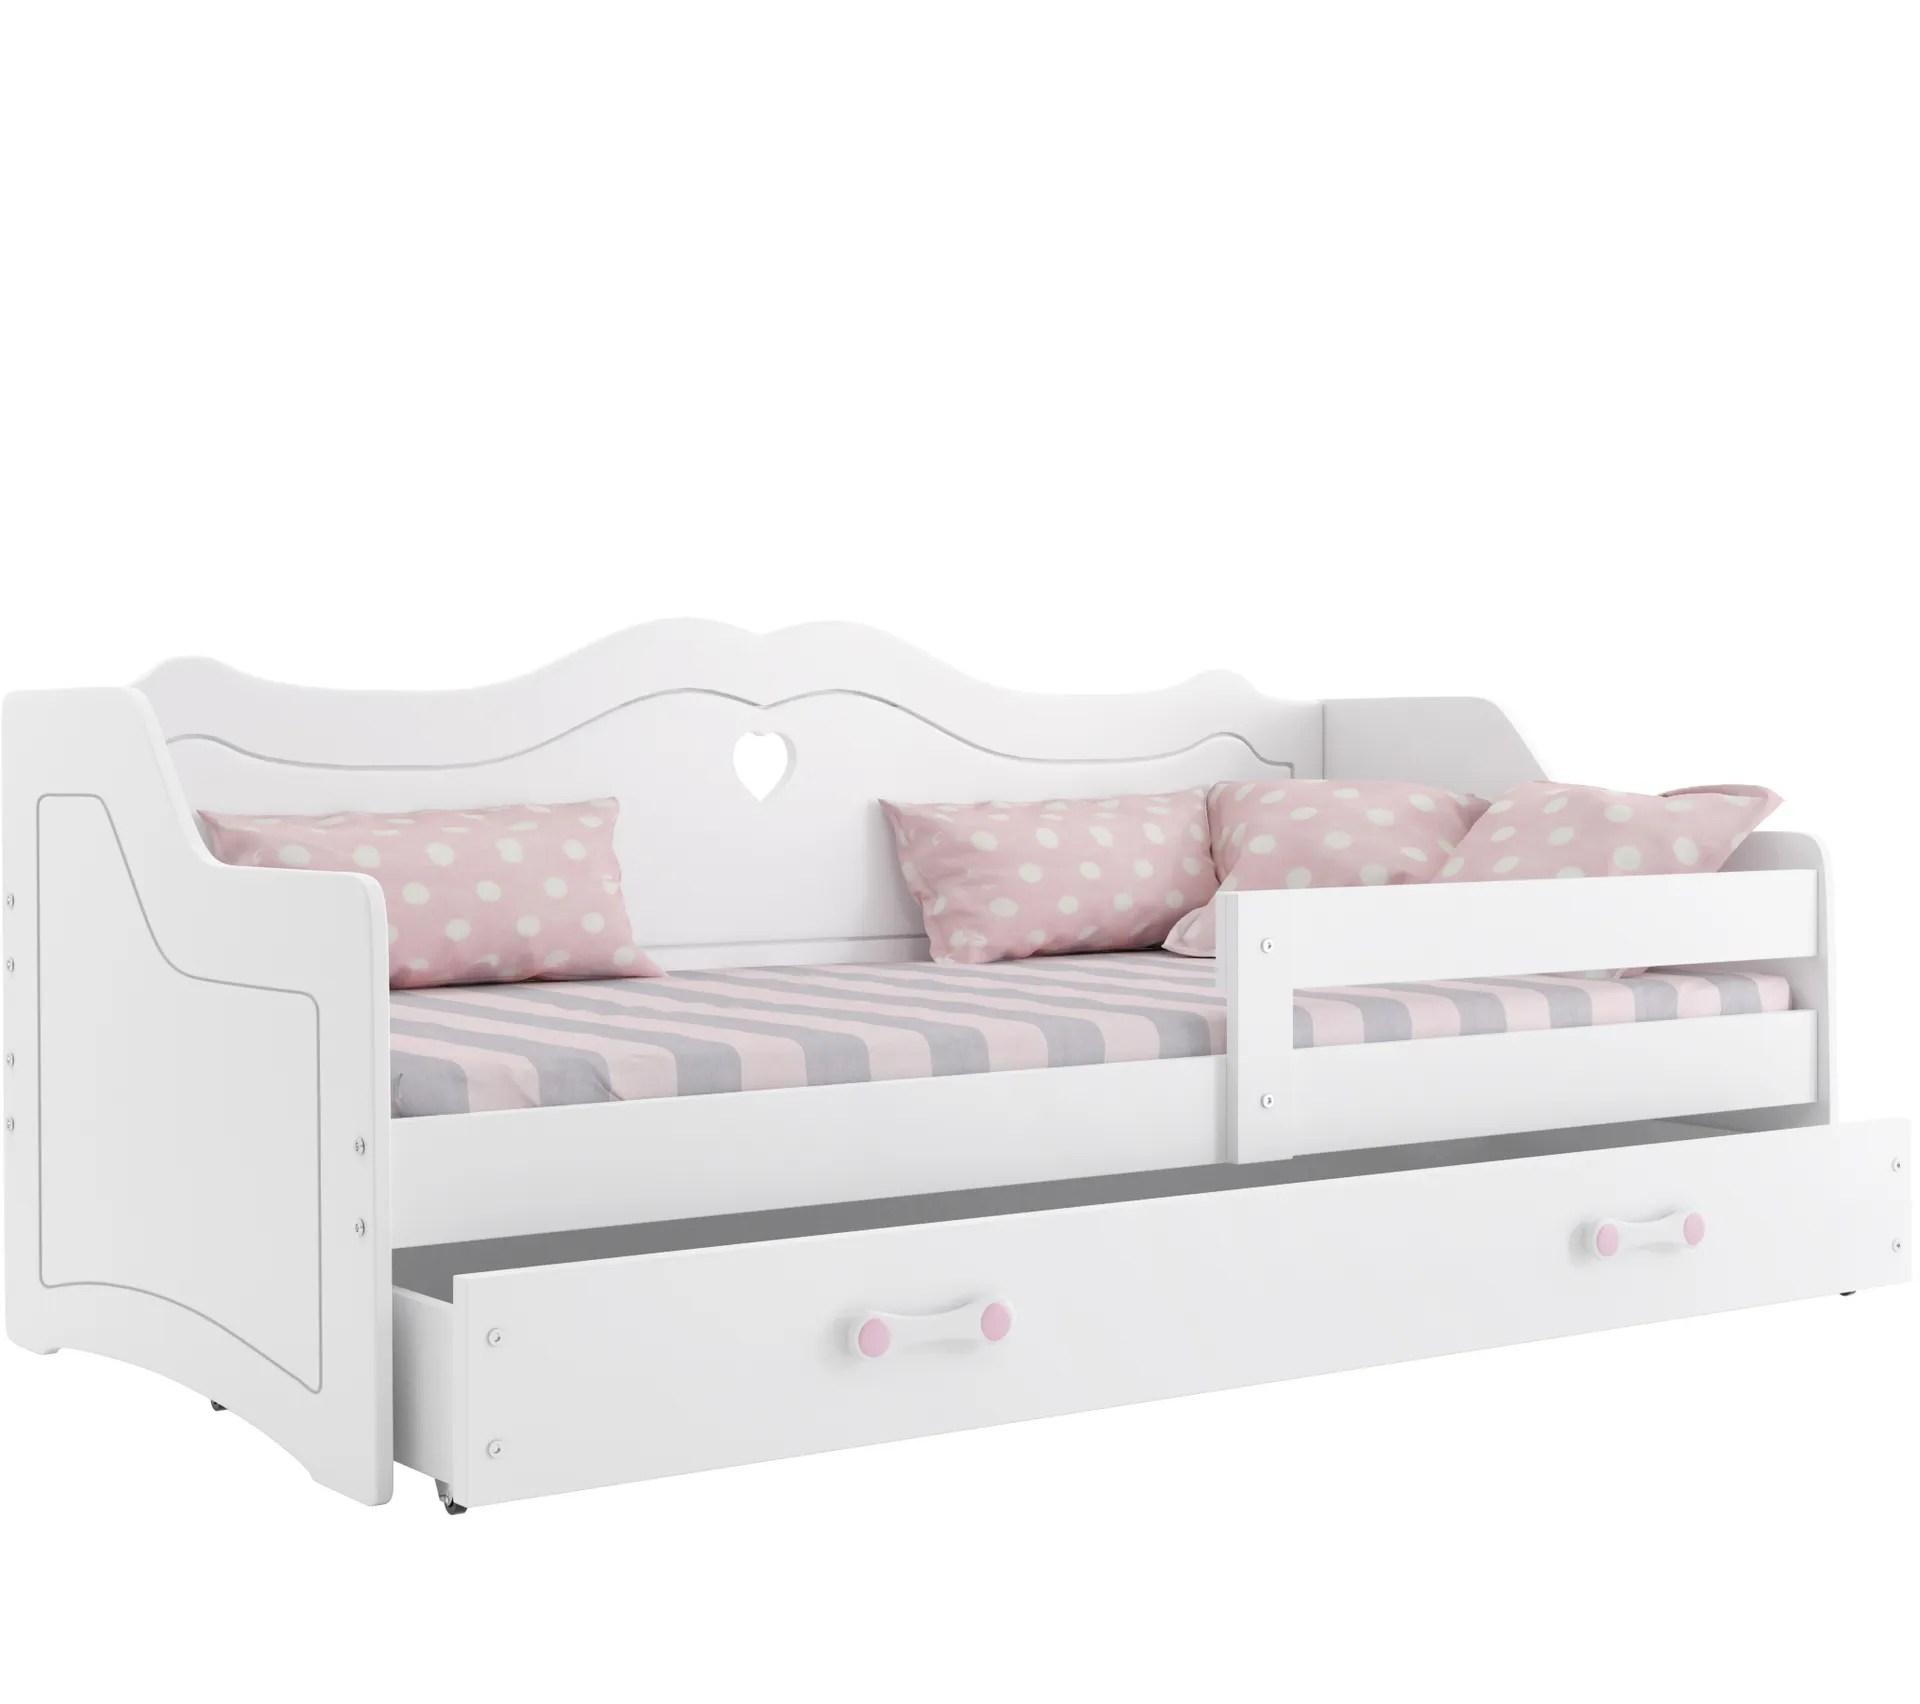 lit enfant julie 80x160 avec matelas sommier et tiroir en blanc